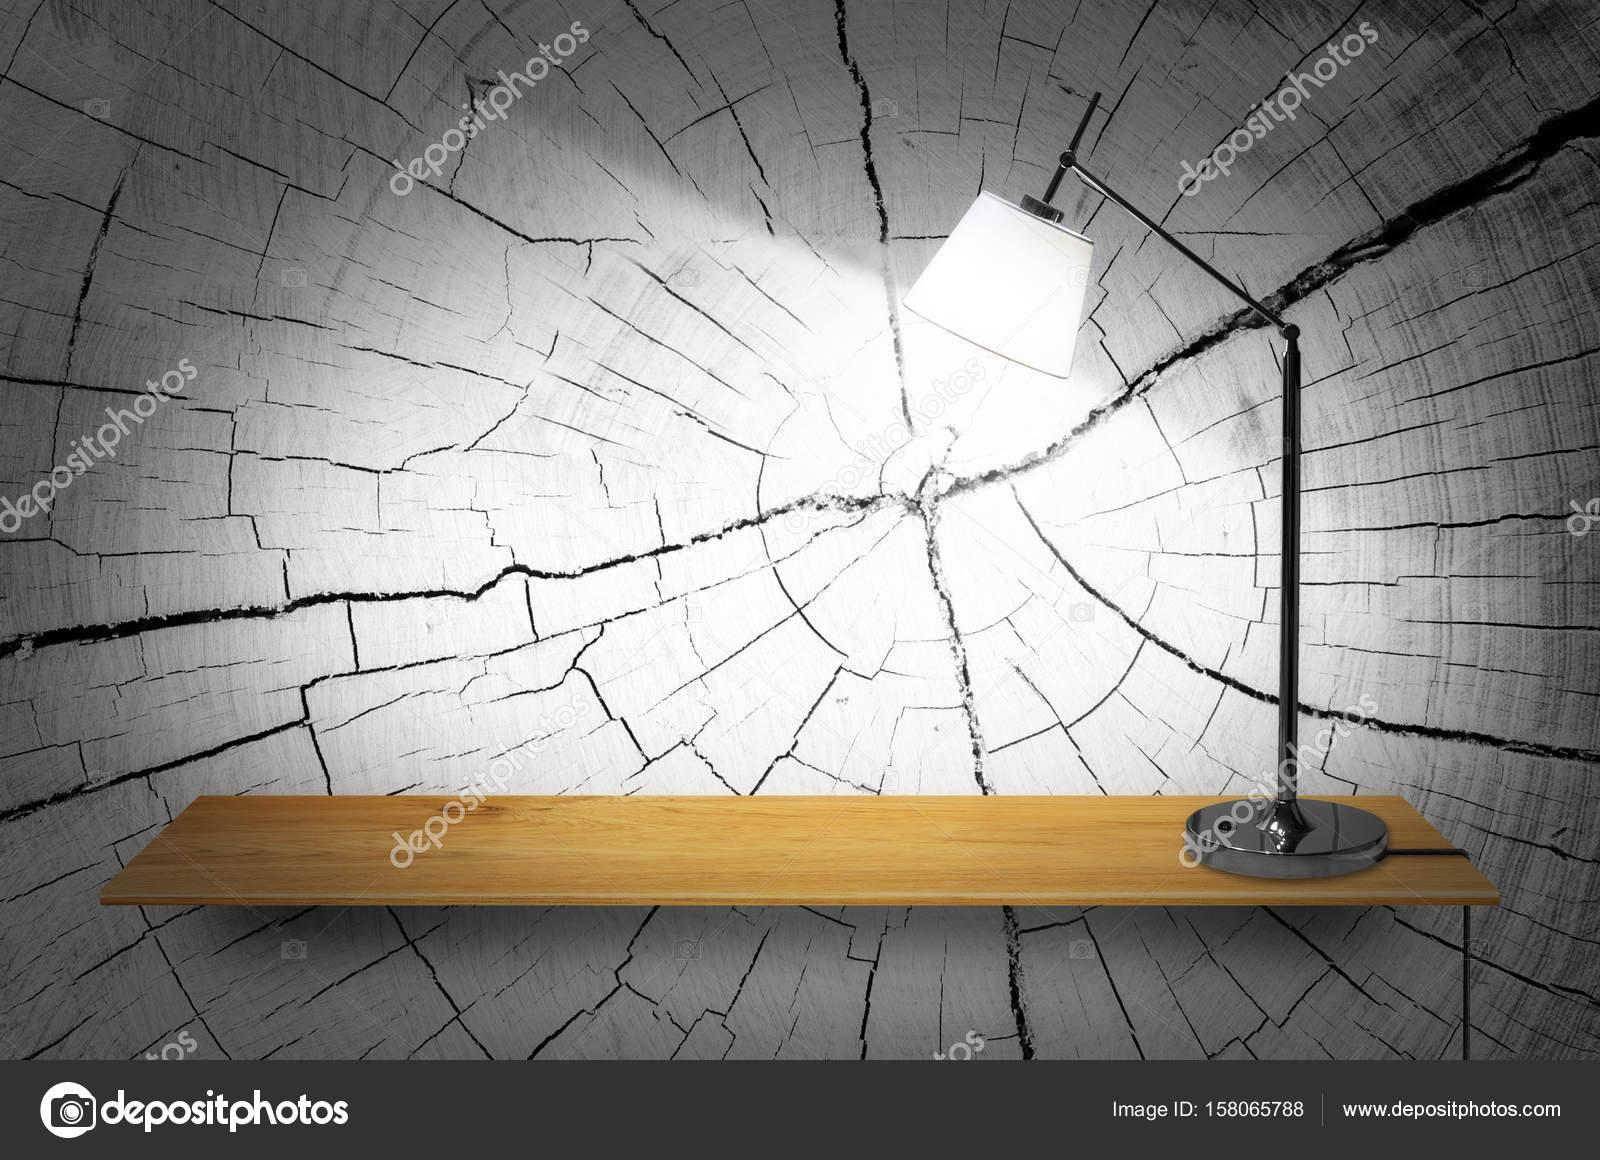 lamp op houten boekenkast — Stockfoto © nirutdps #158065788